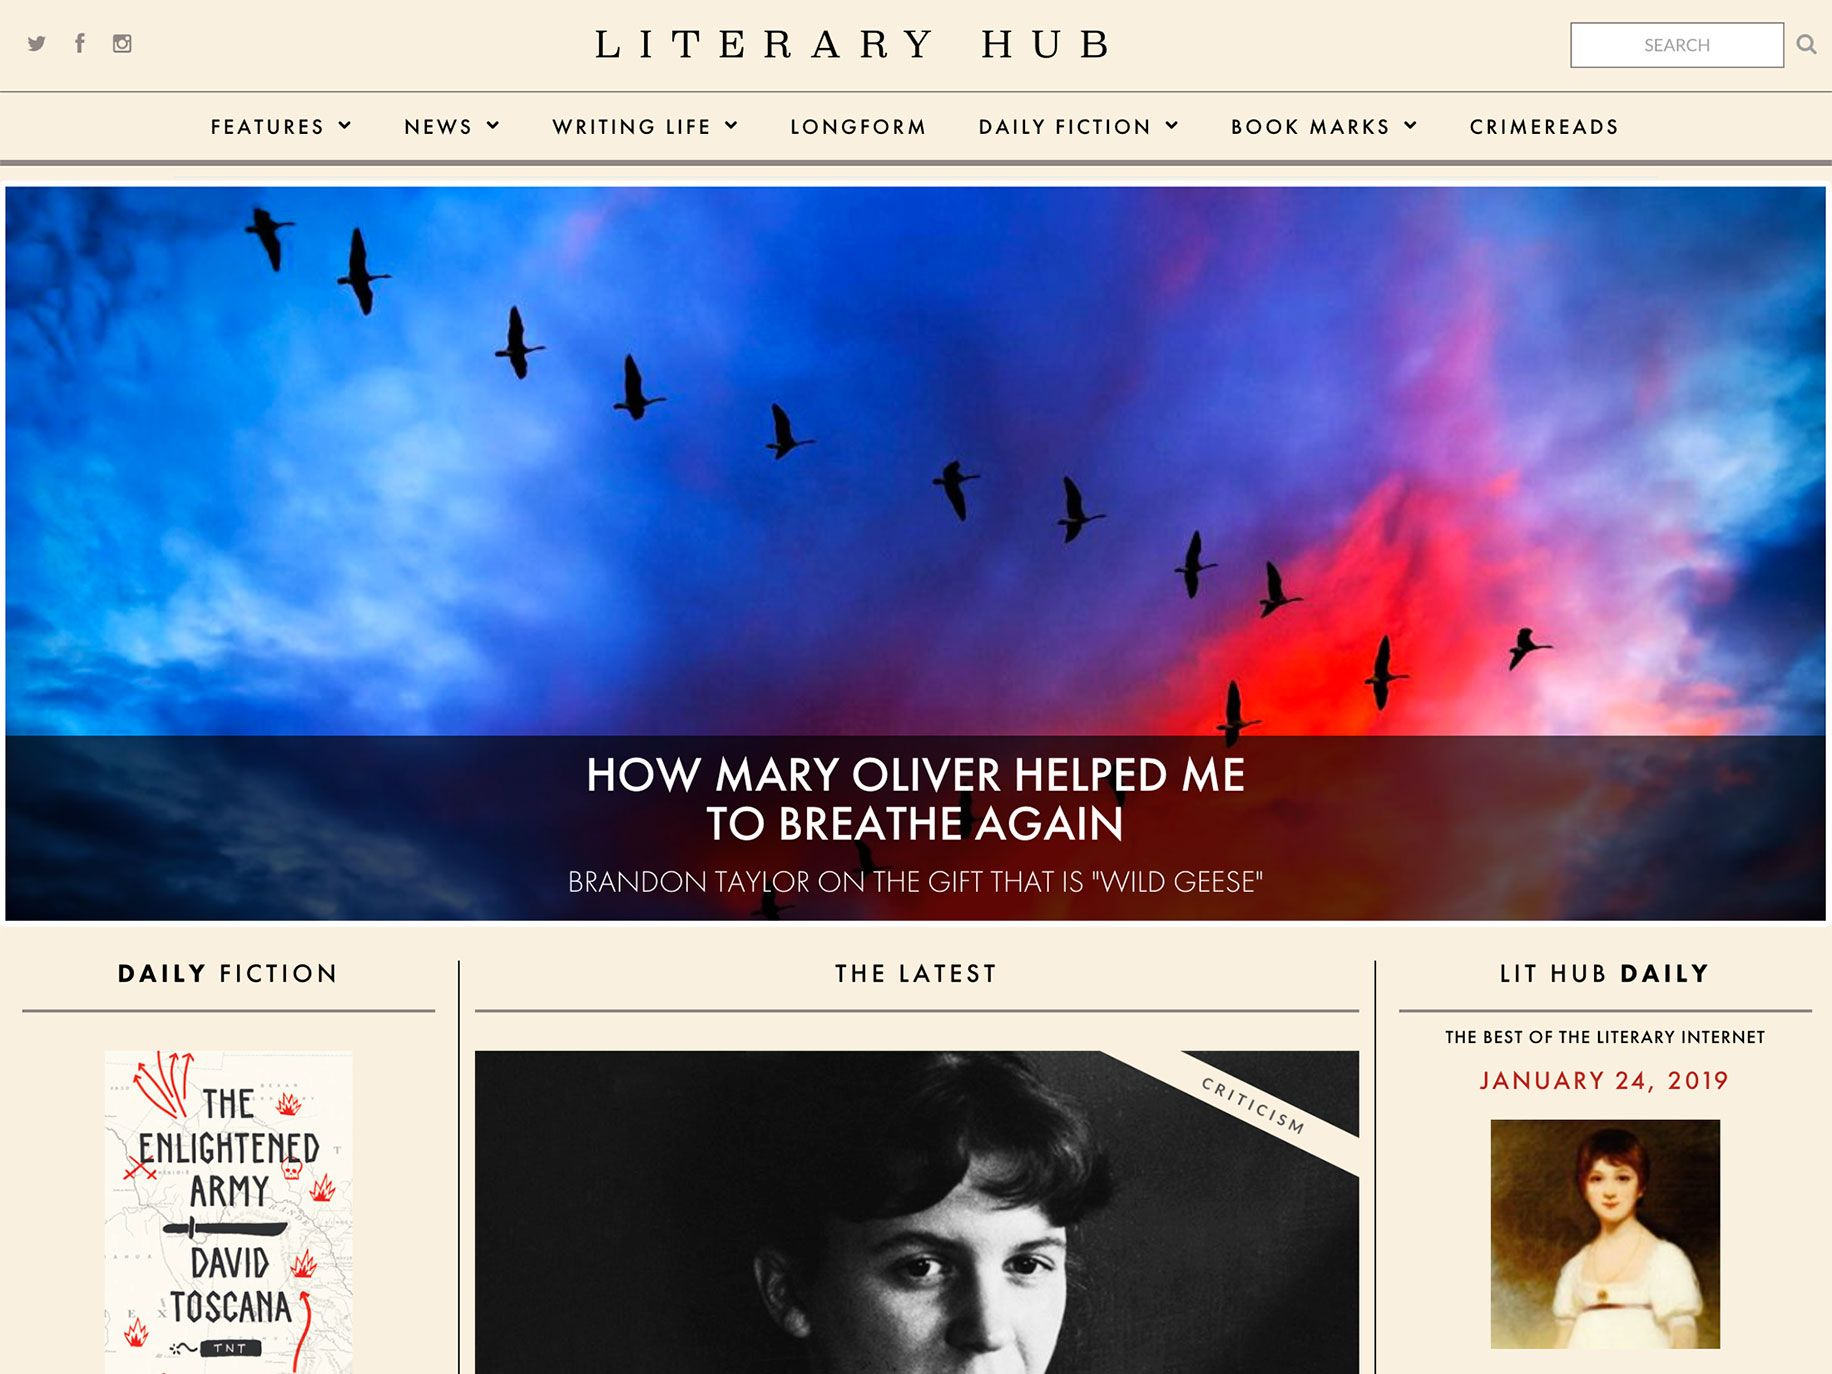 The Literary Hub homepage